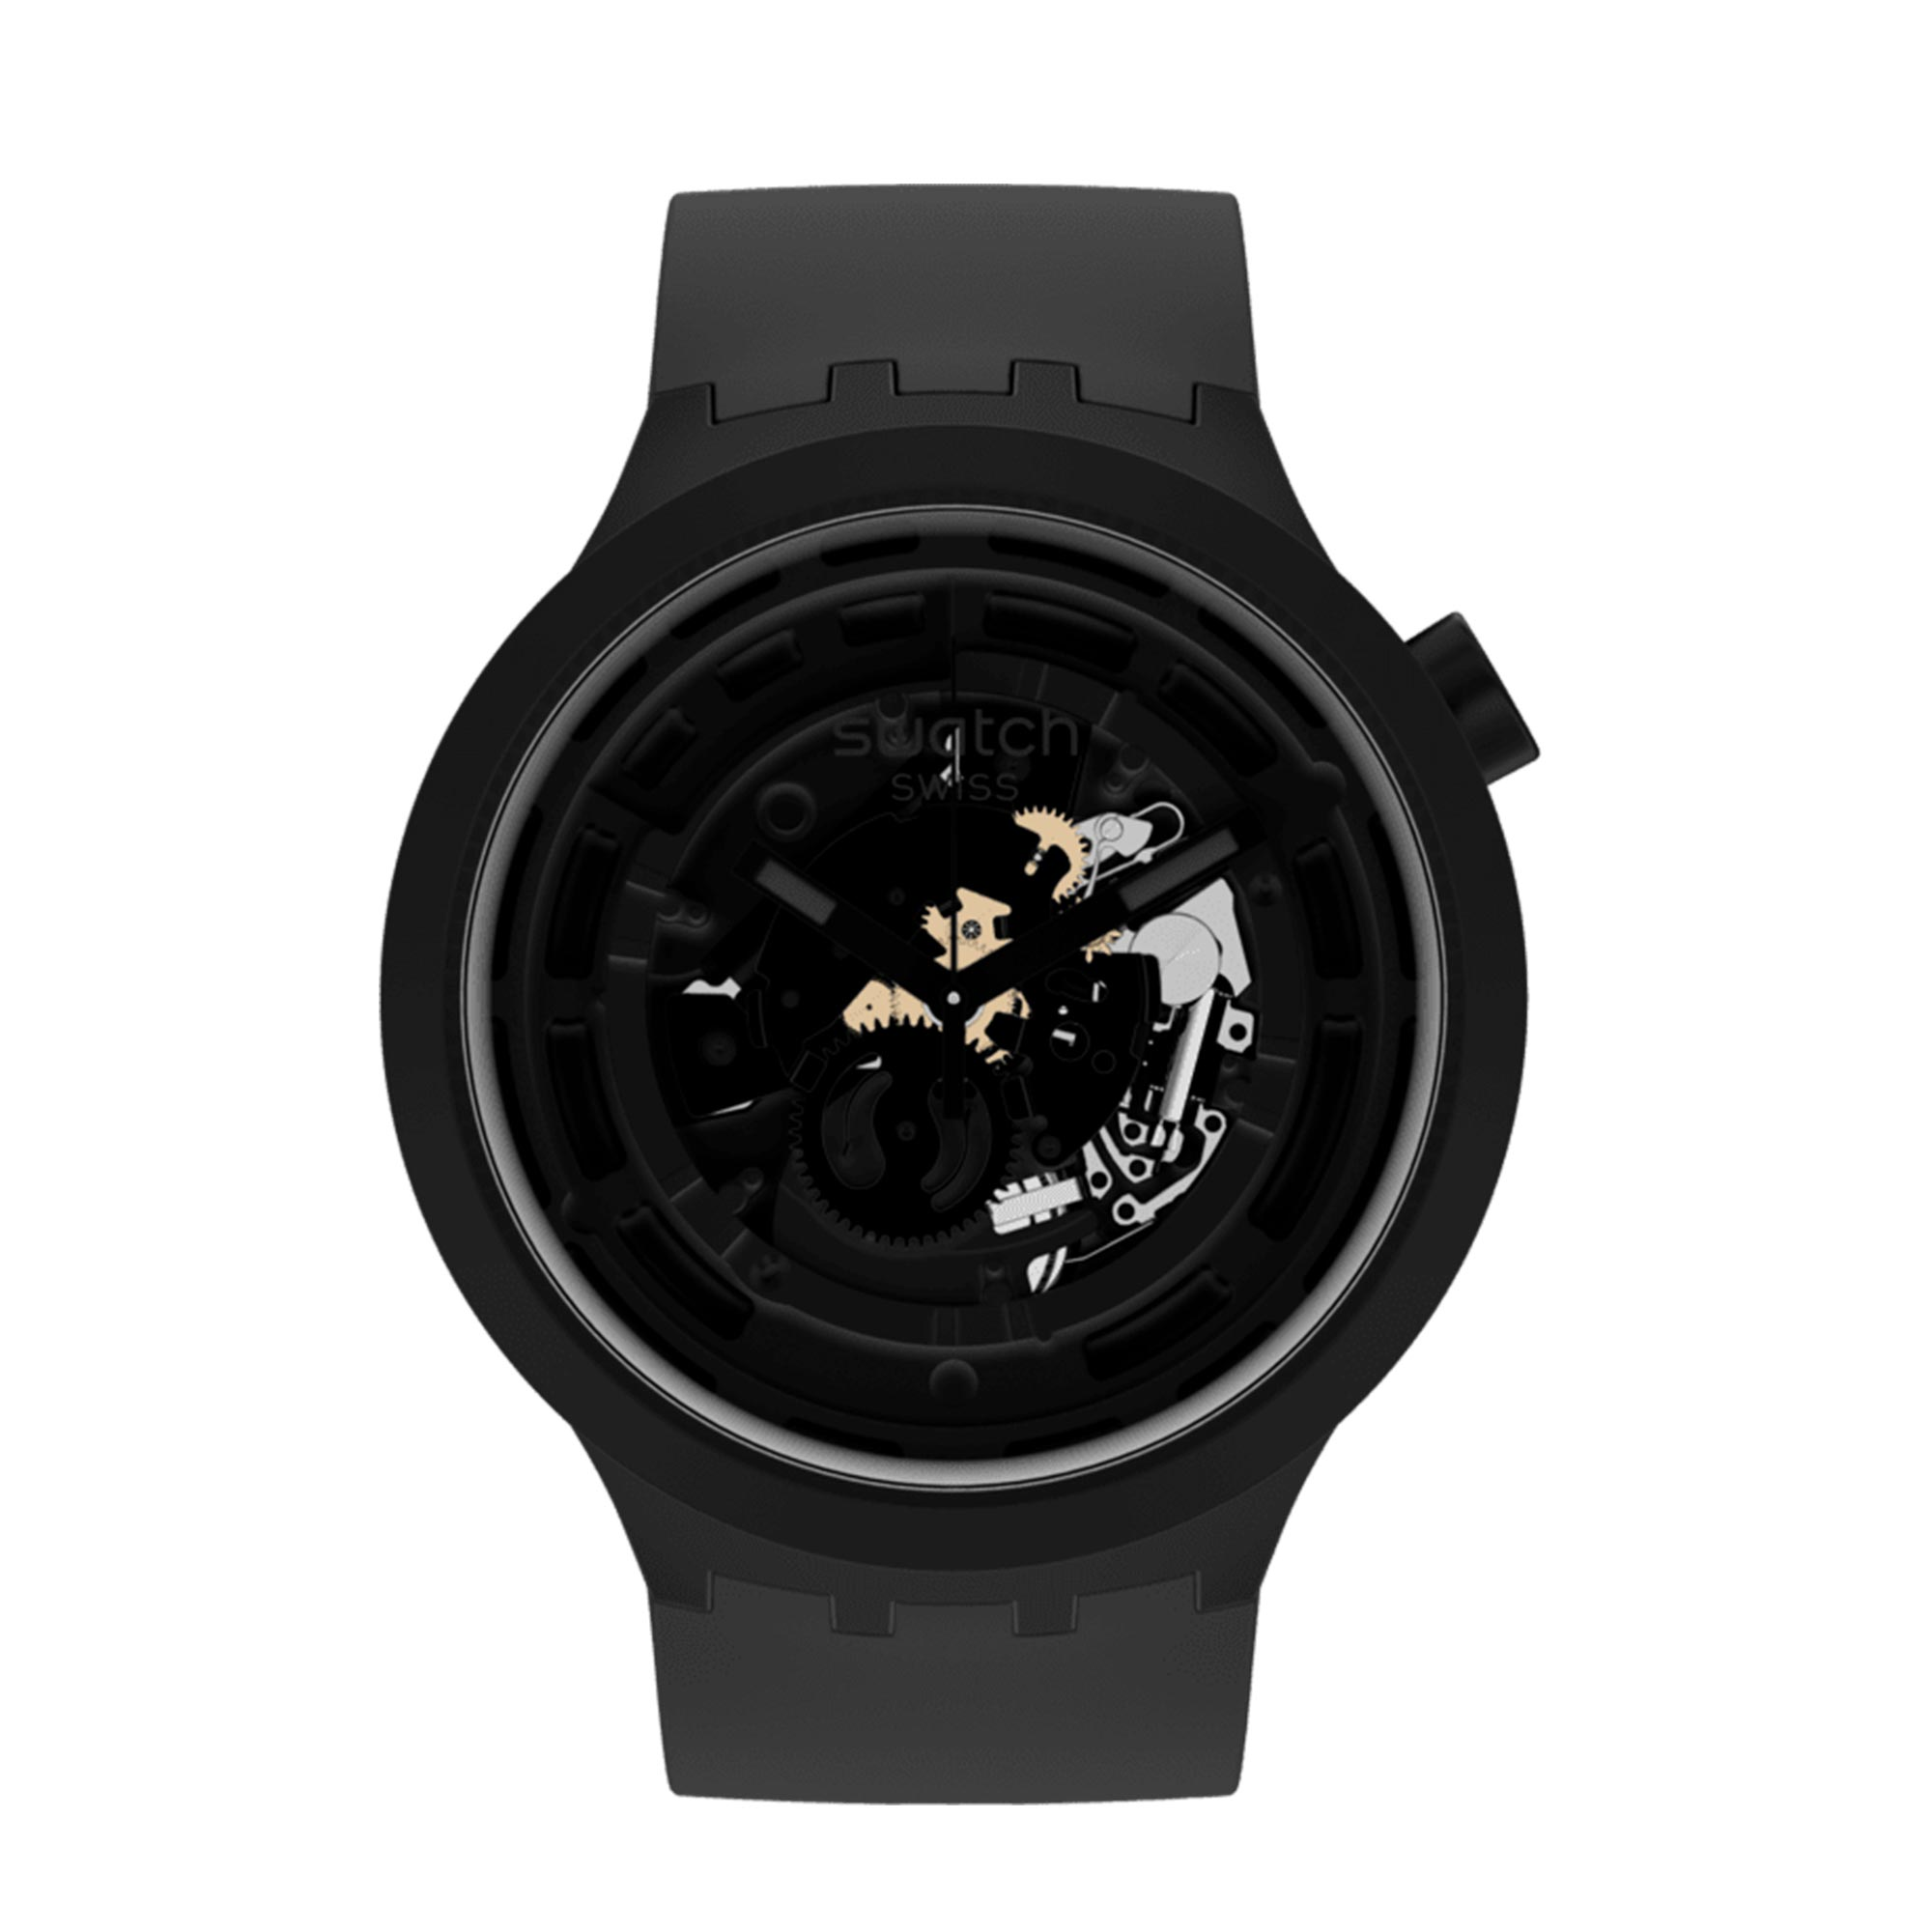 Swatch Big Bold Next Quartz Black BioCeramic Silicone Watch SB03B100